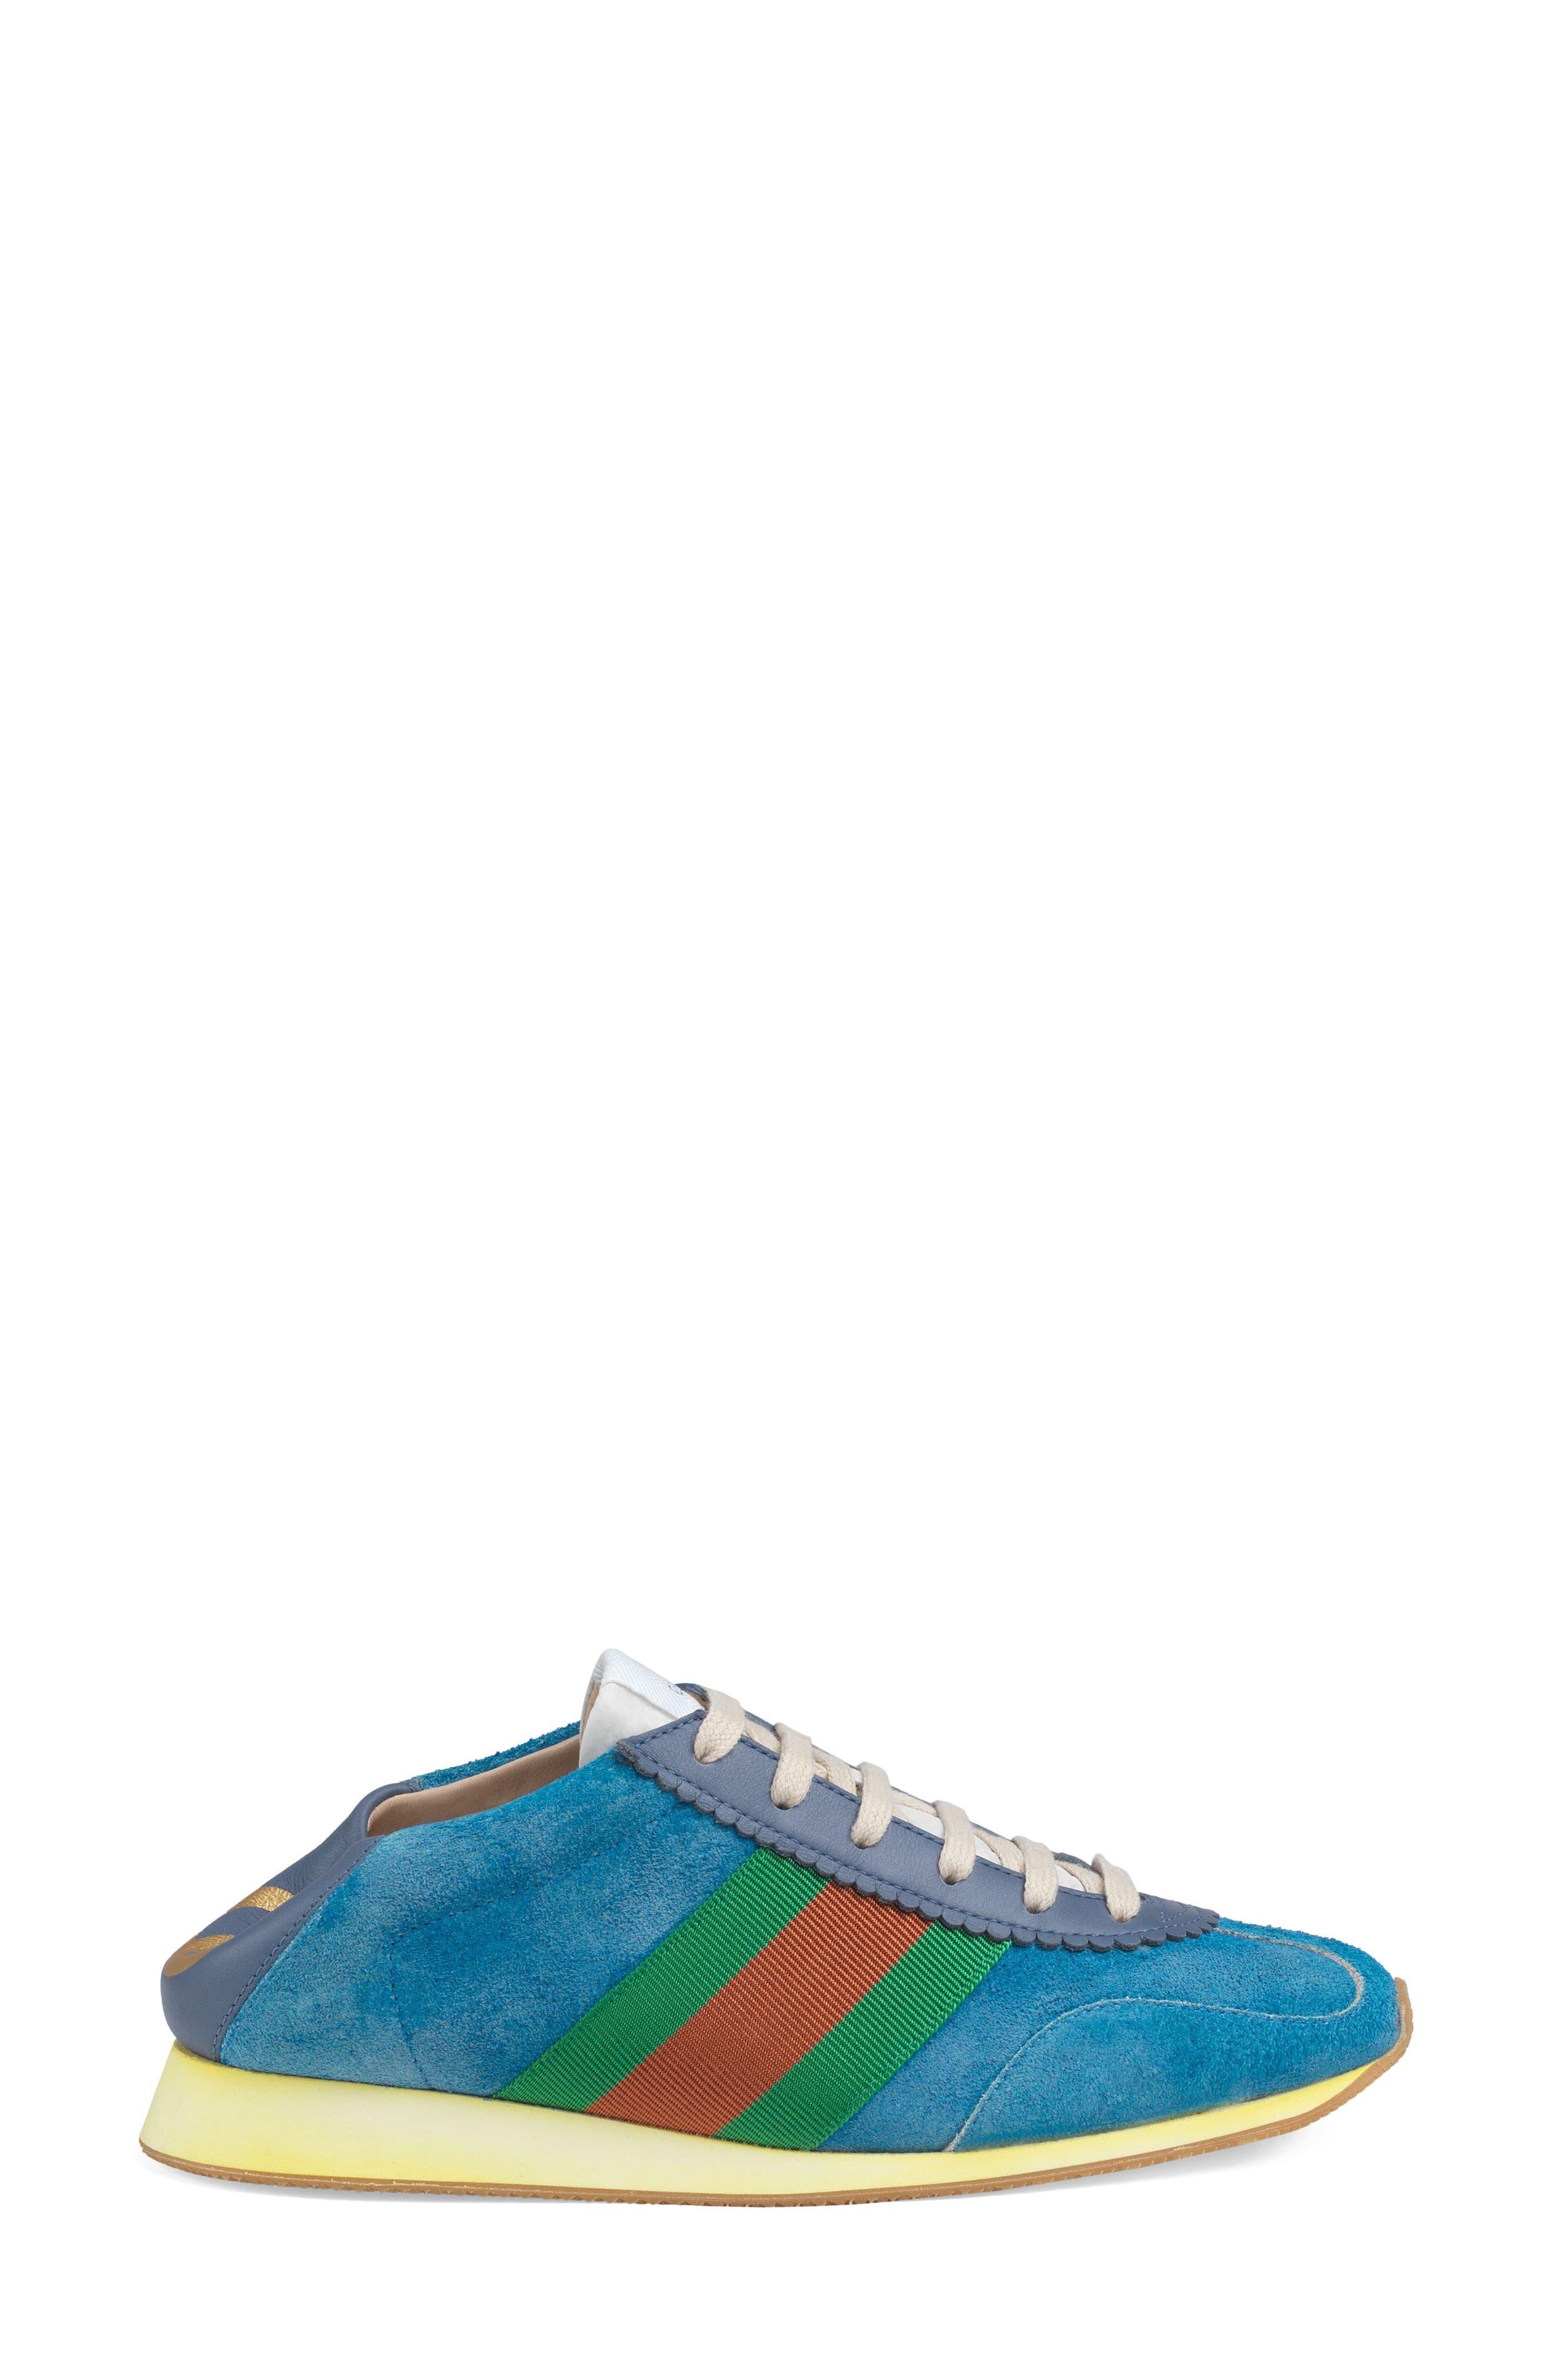 Rocket Convertible Sneaker,                             Alternate thumbnail 4, color,                             BLUE